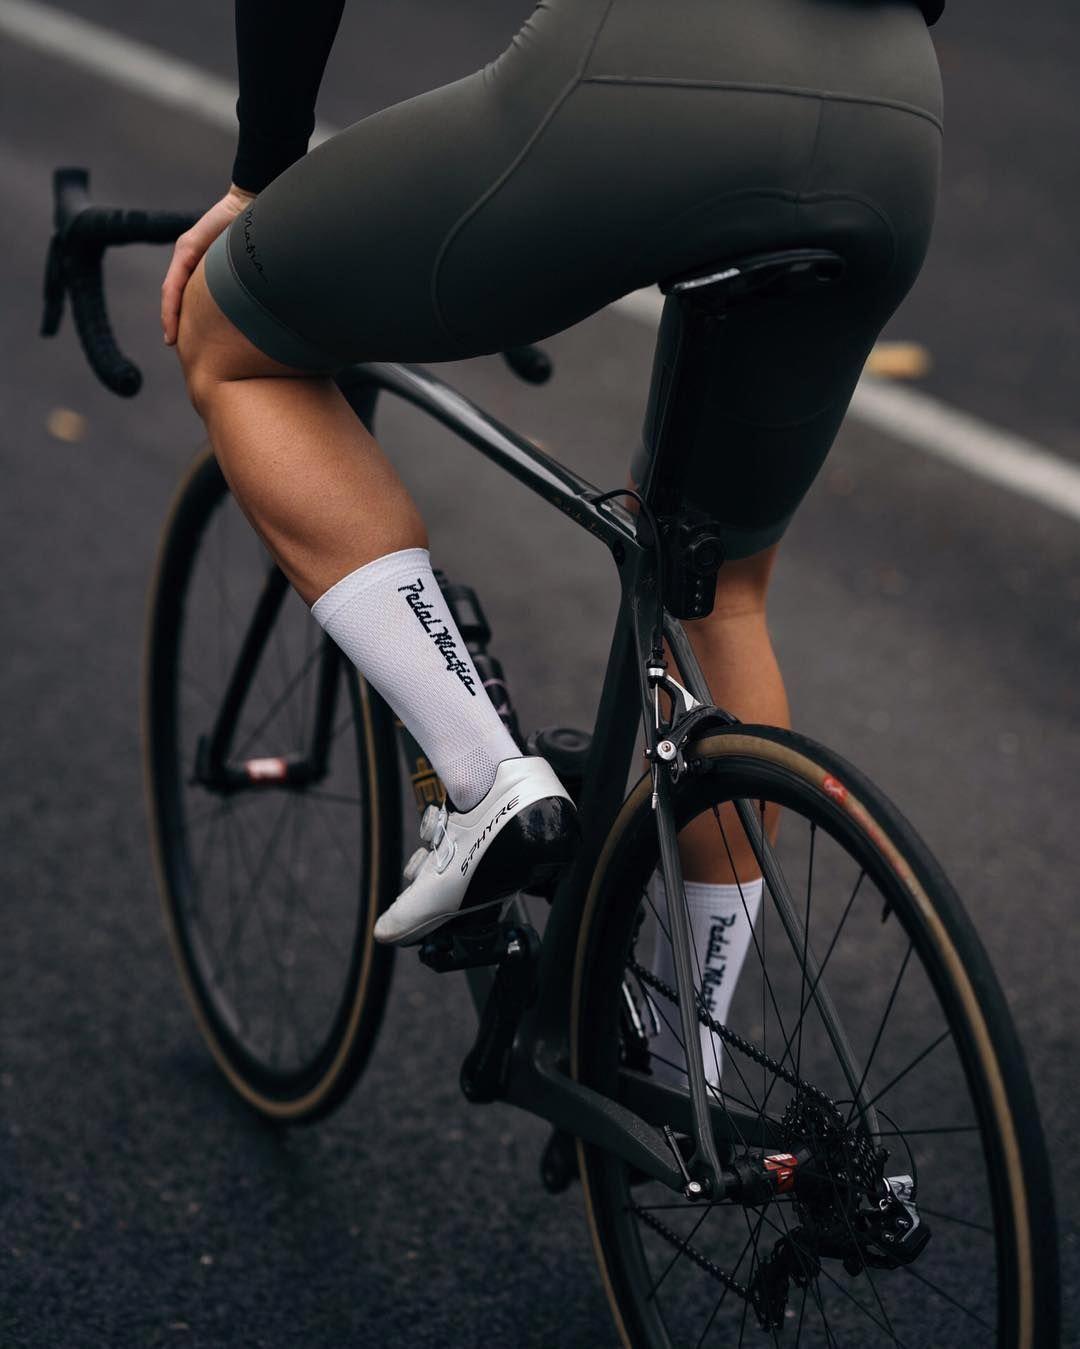 Bicycle Maintenance Bicycle Custom Cycling Kit Cycling Wear